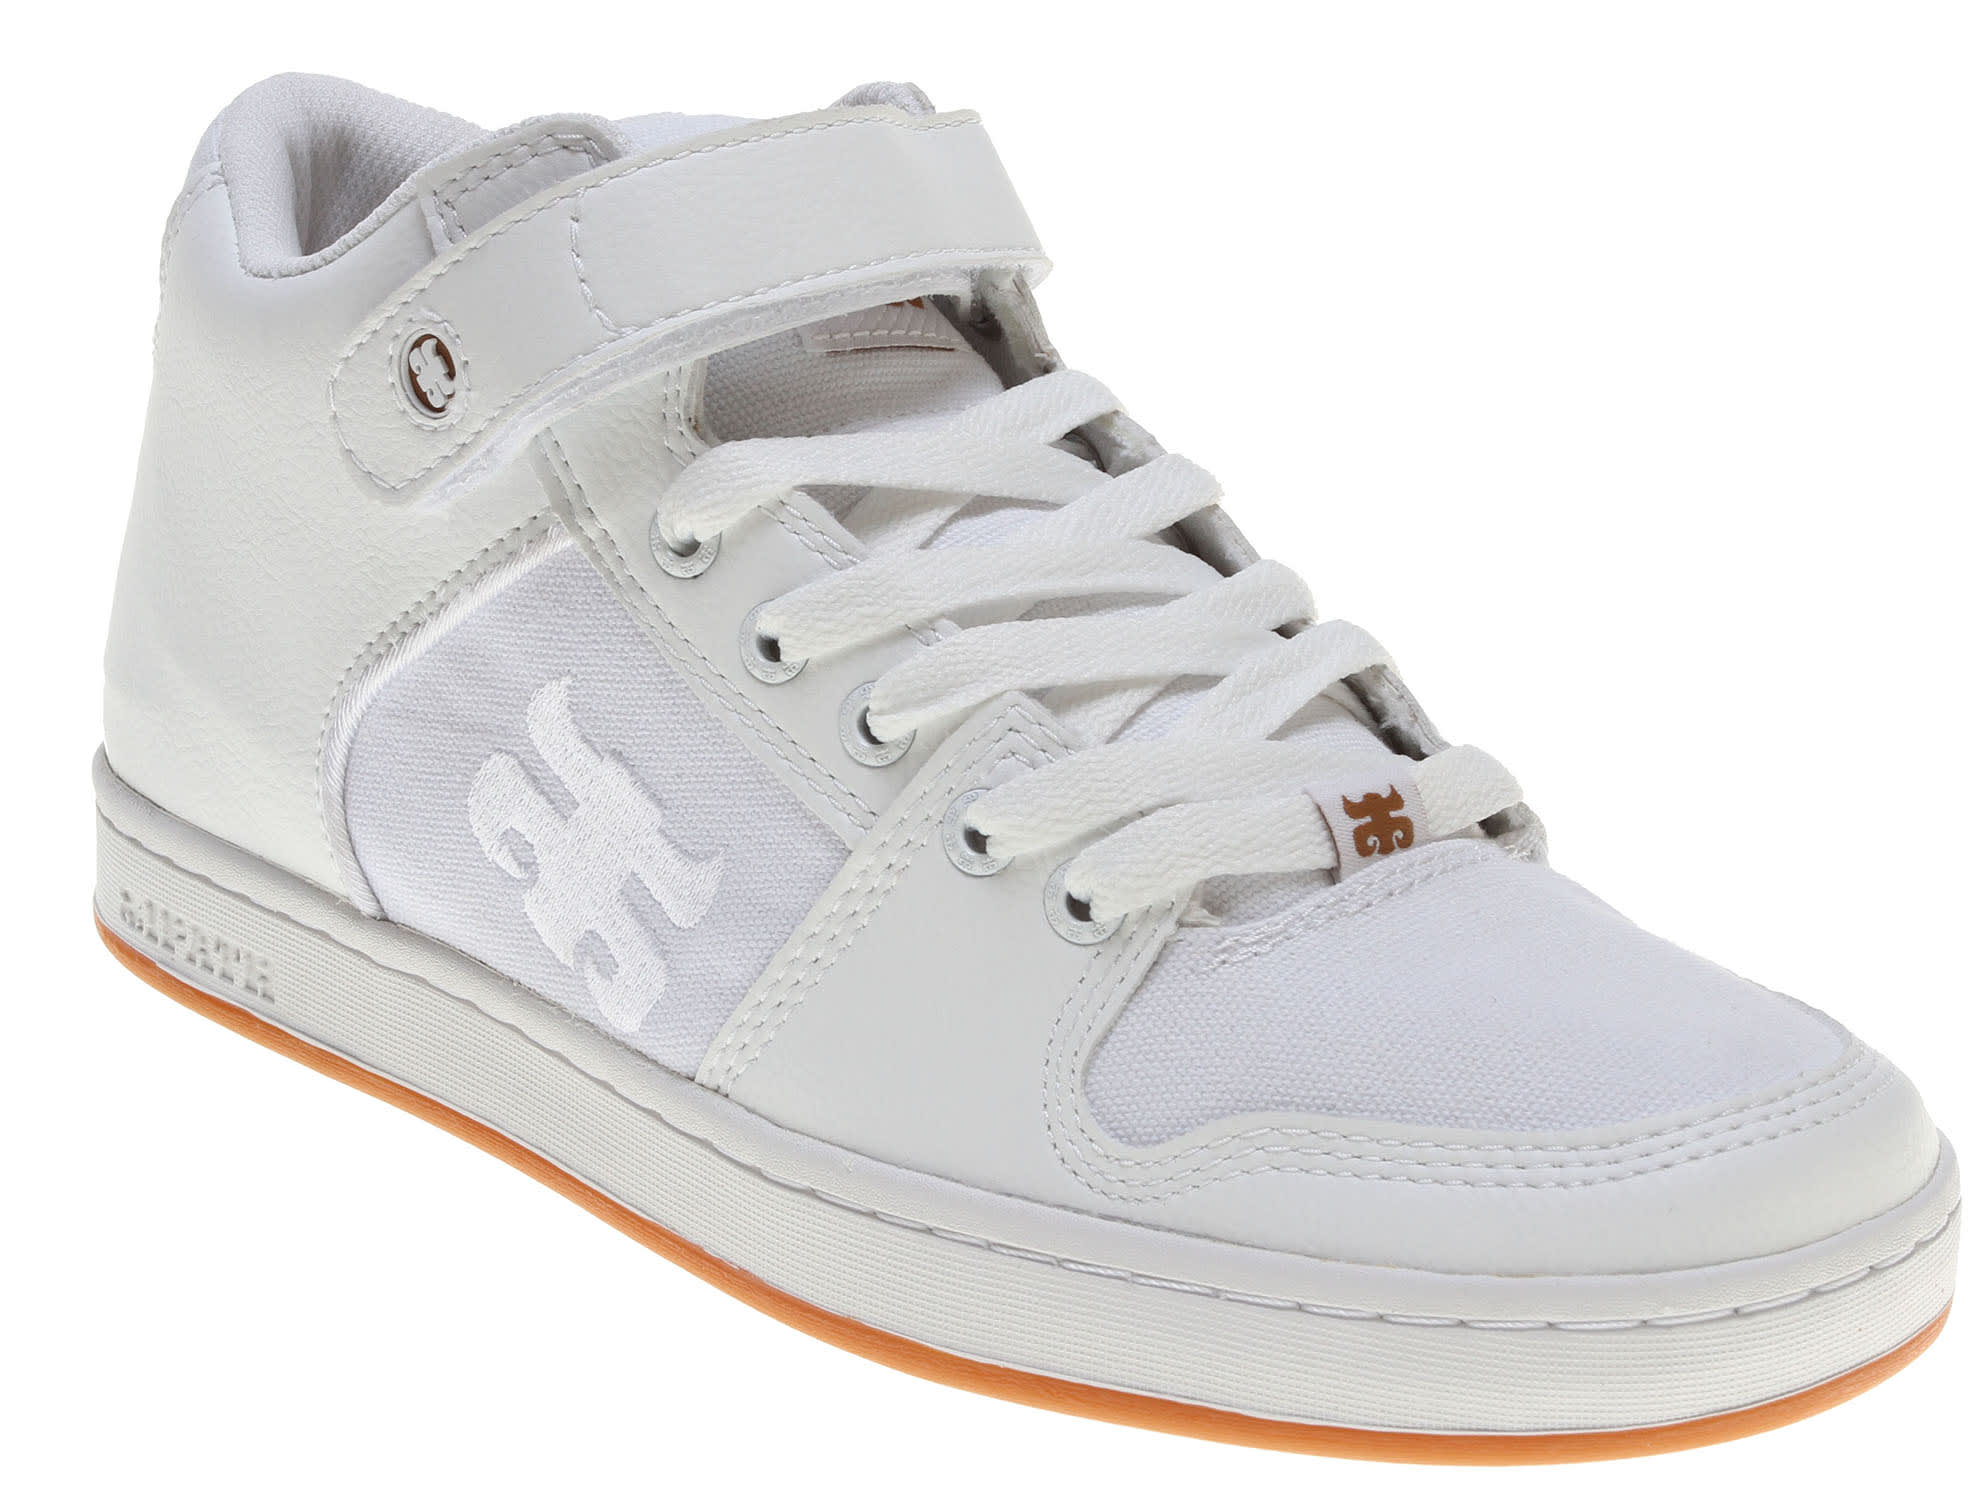 separation shoes dfc93 3ef11 Ipath Grasshopper Skate Shoes - thumbnail 2